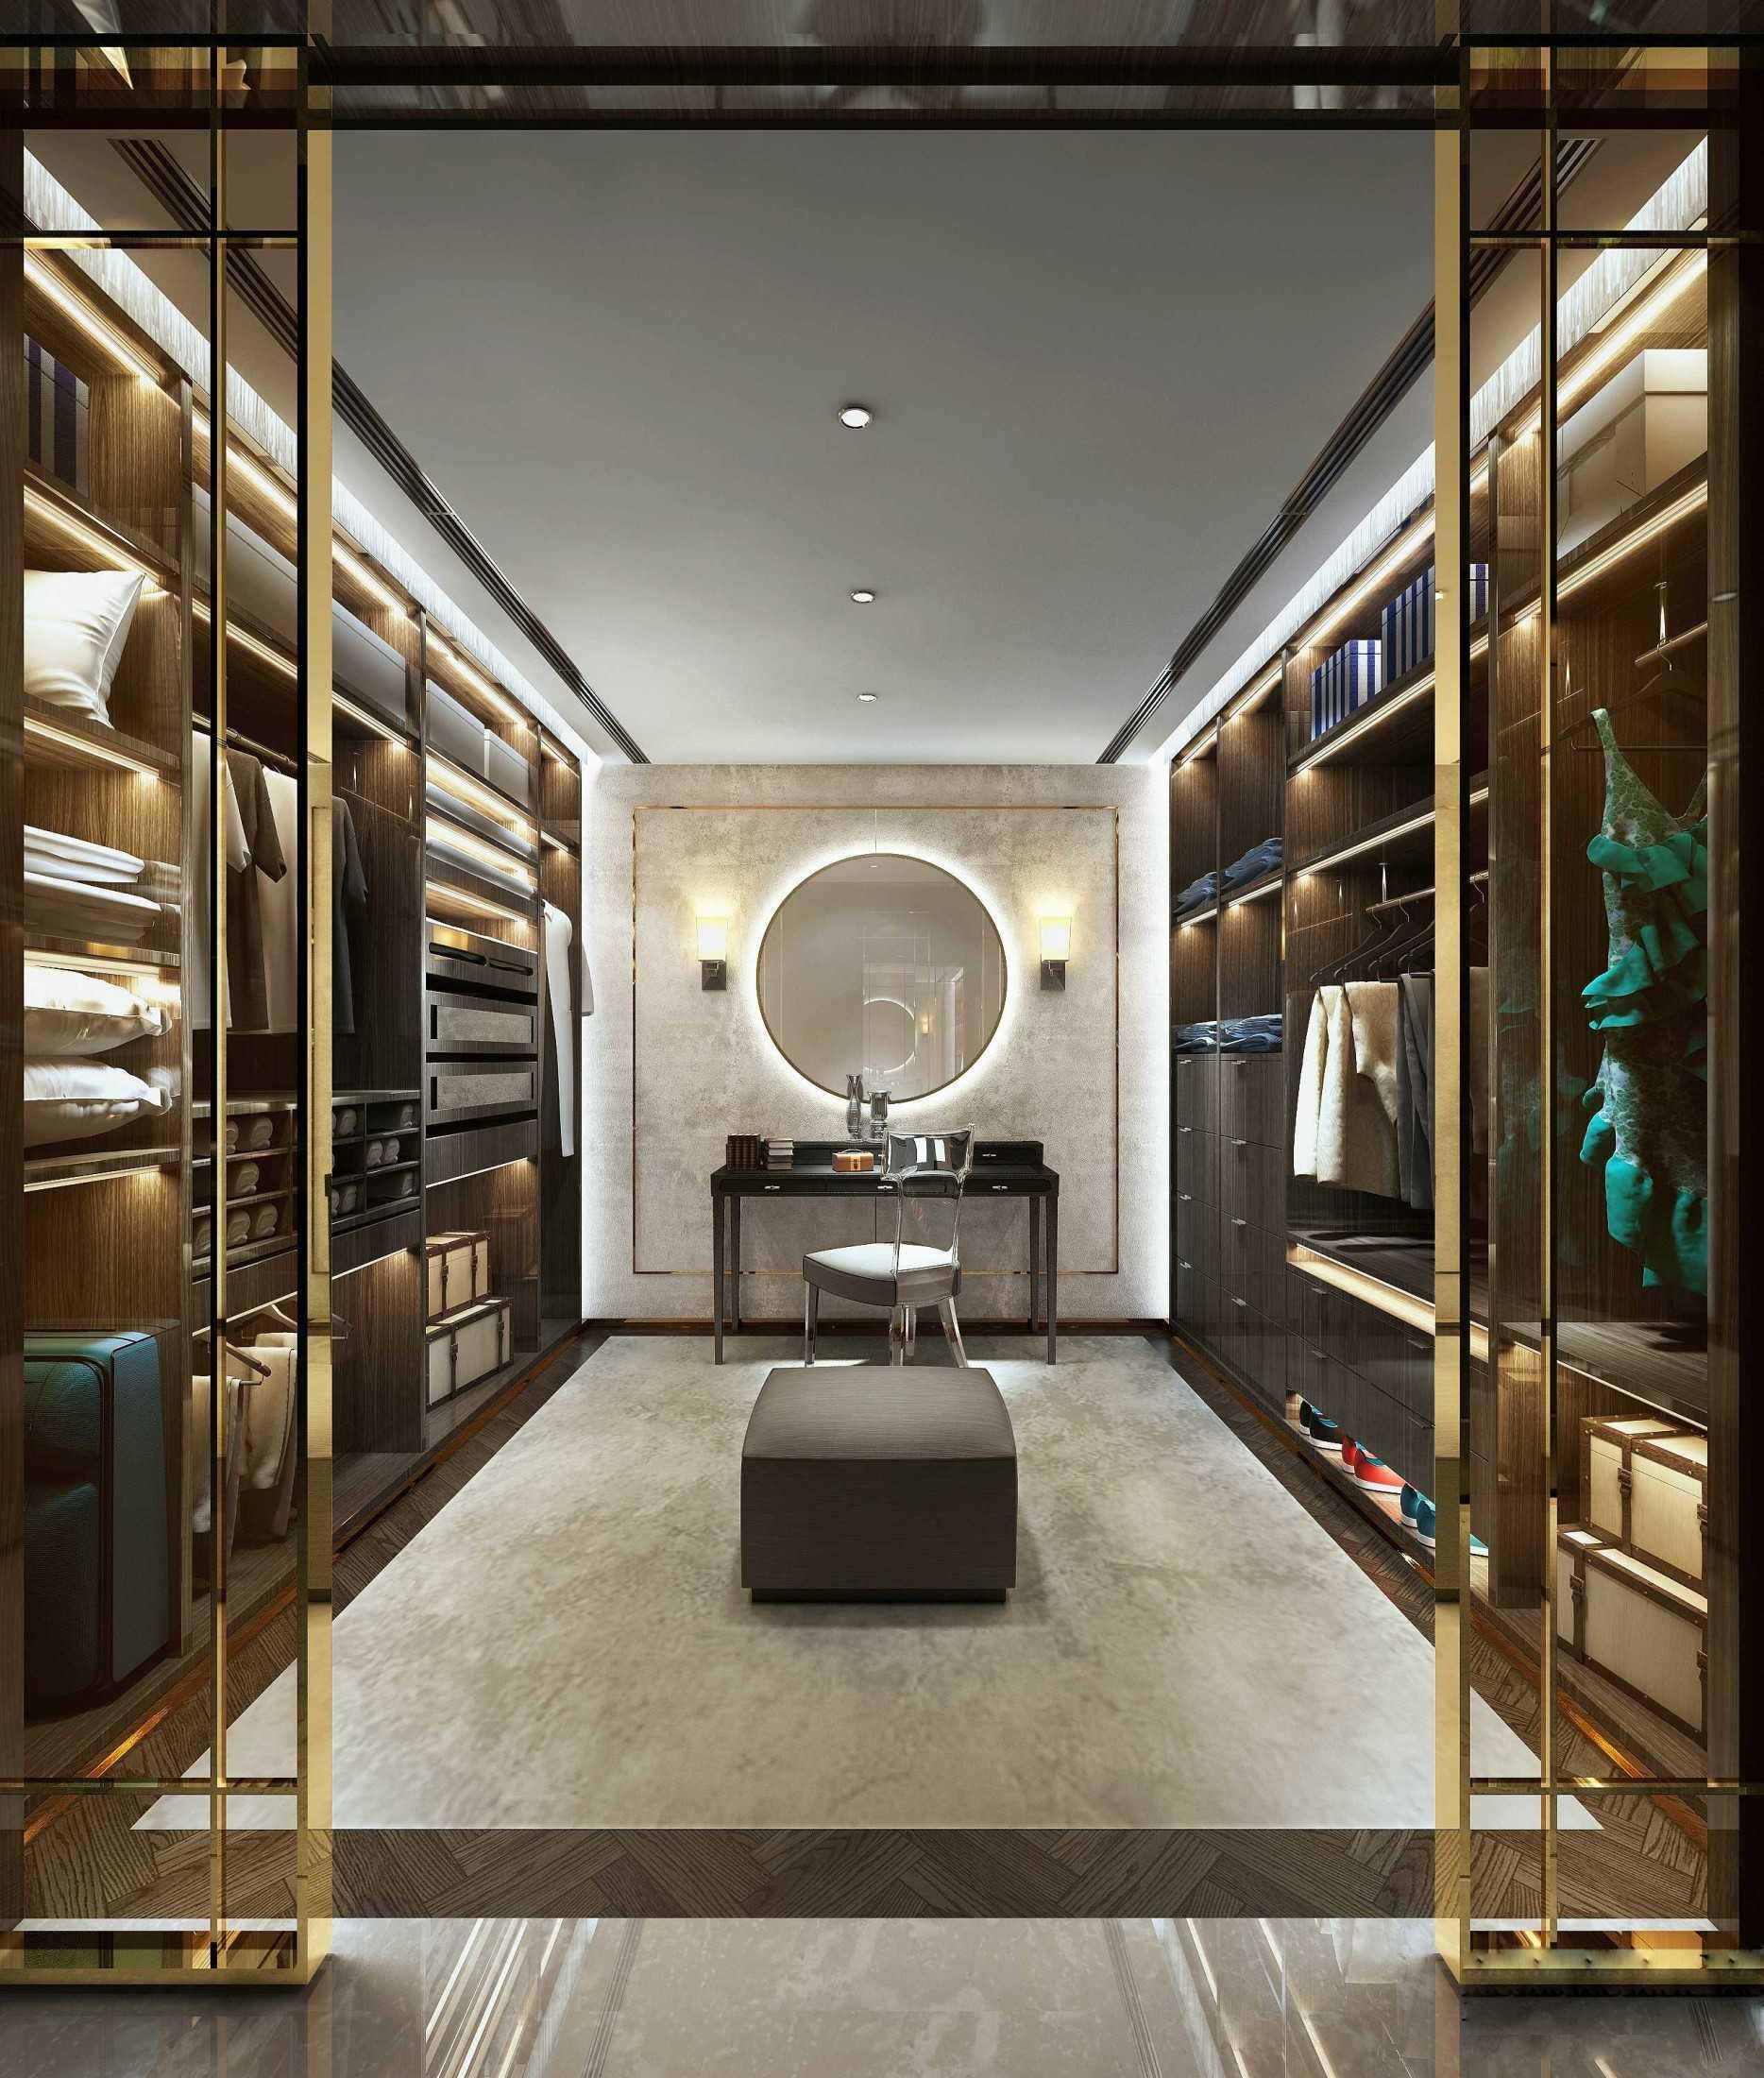 Bej.interior Luxury Wardrobe/closet/display Area Jakarta, Daerah Khusus Ibukota Jakarta, Indonesia Jakarta, Daerah Khusus Ibukota Jakarta, Indonesia Bejinterior-Luxury-Interior-Home  80478